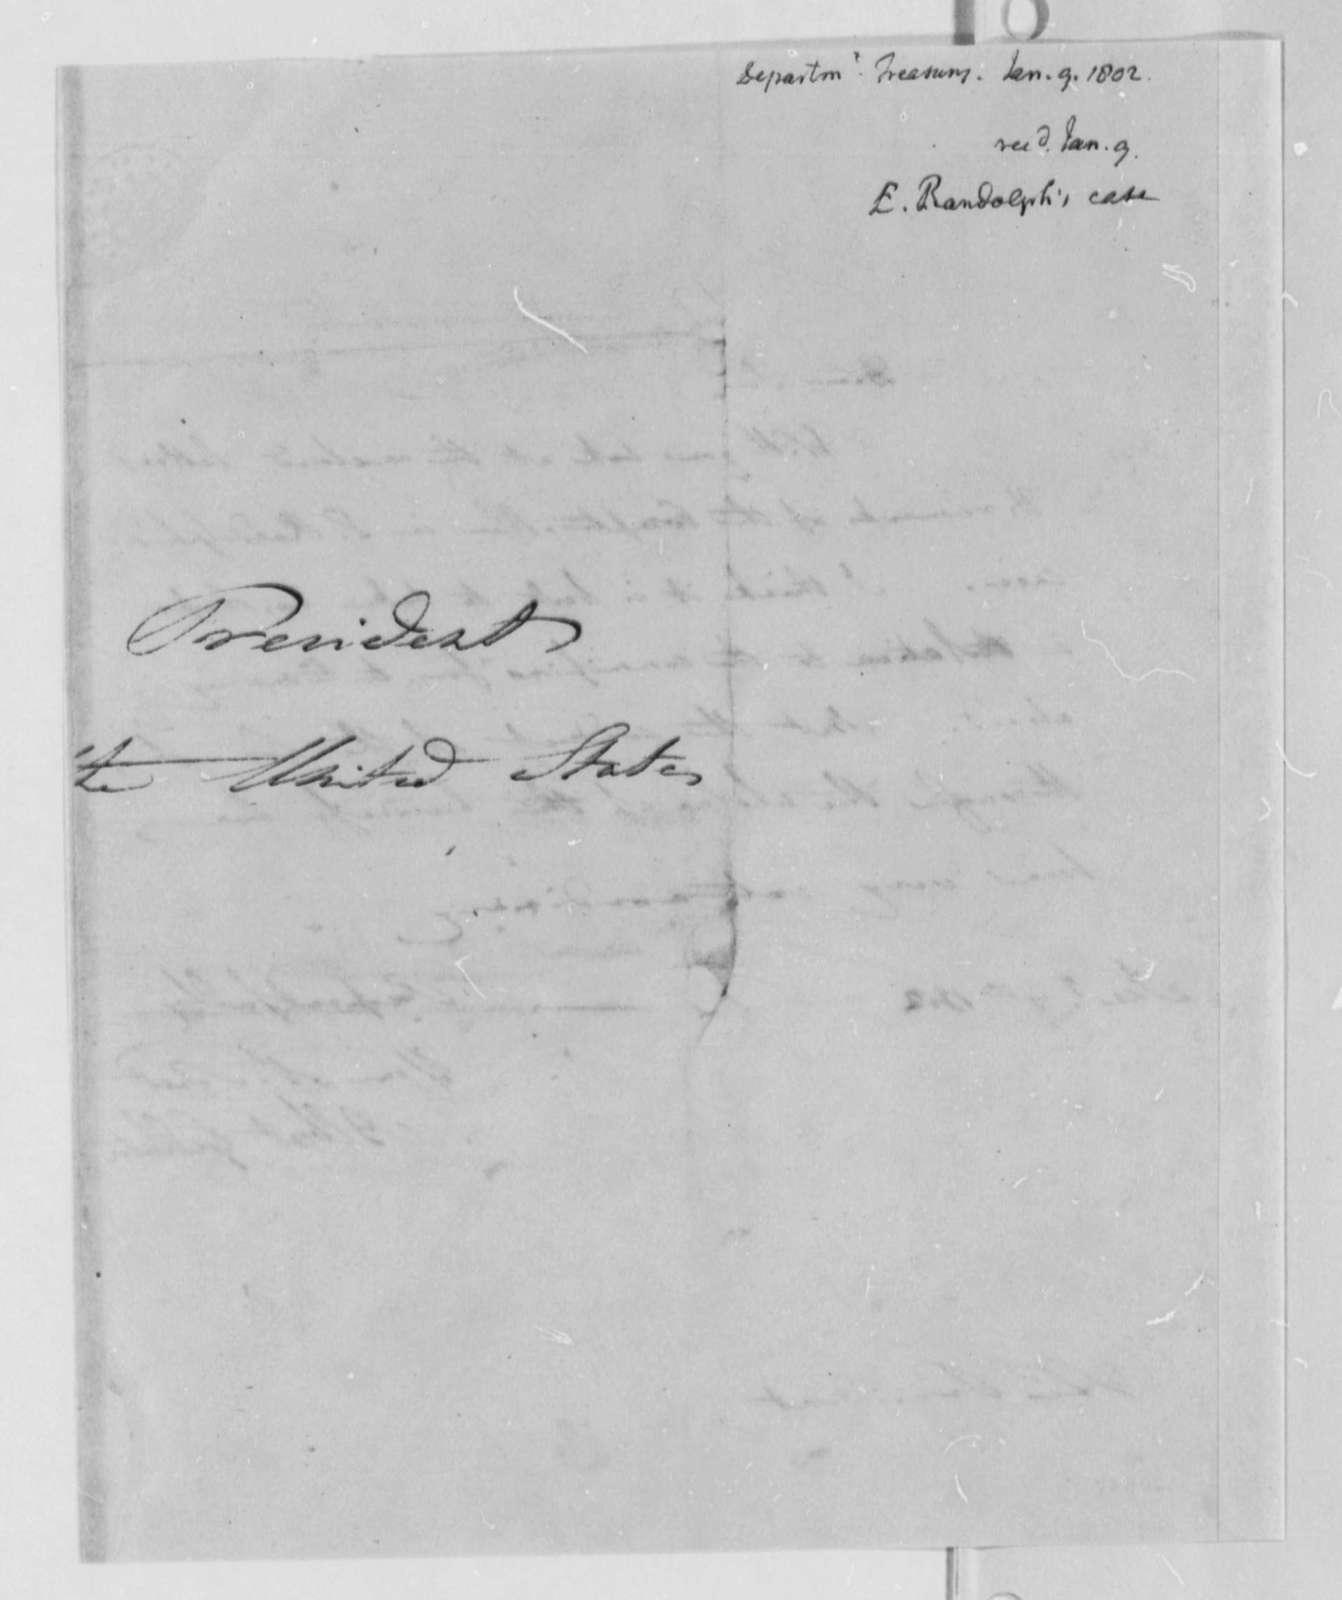 Albert Gallatin to Thomas Jefferson, January 9, 1802